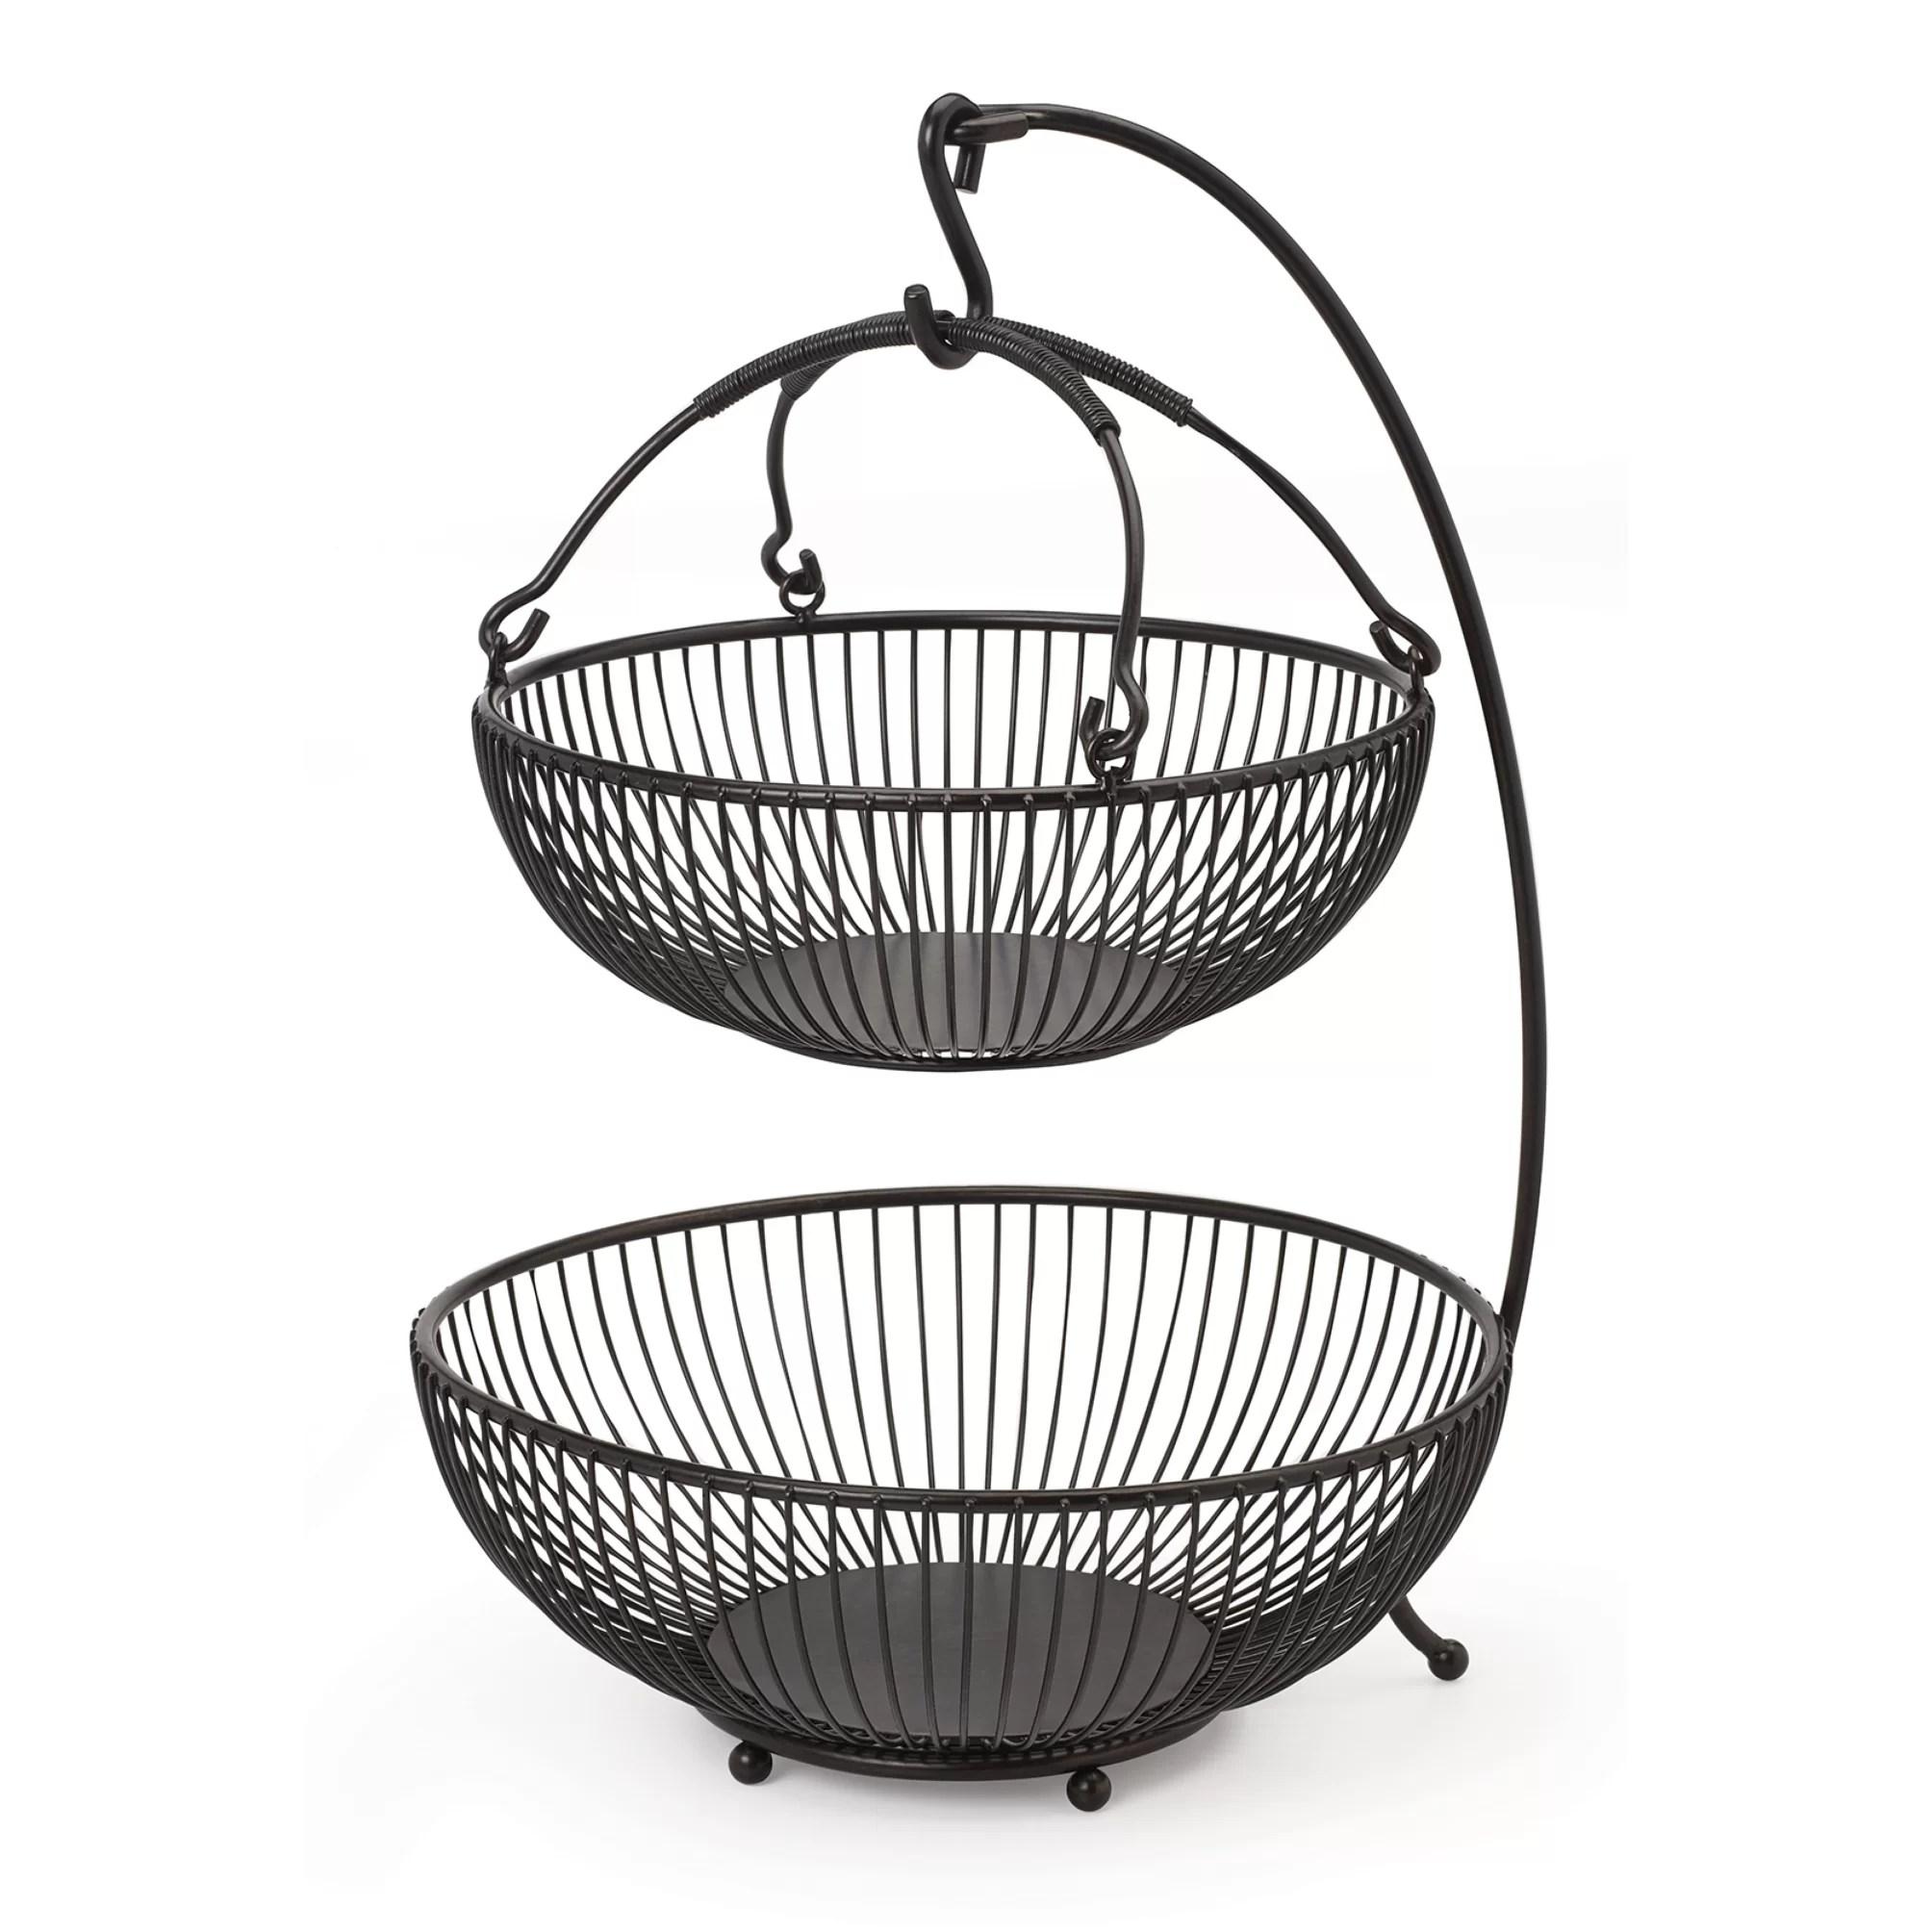 Gourmet Basics By Mikasa Spindle 2 Tier Adjustable Basket